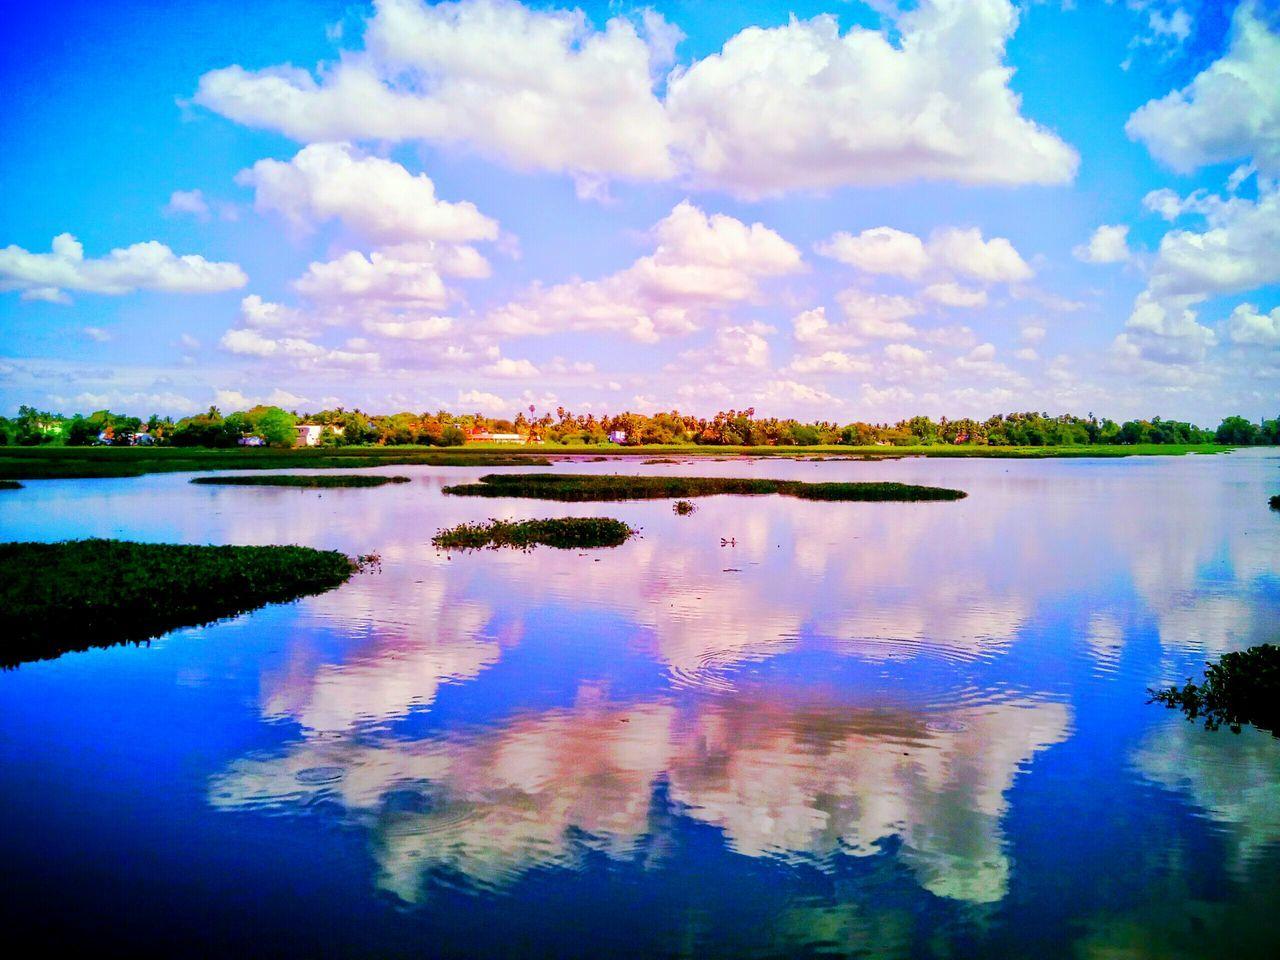 Picture Was Nainari Lake At Tirunelveli,India